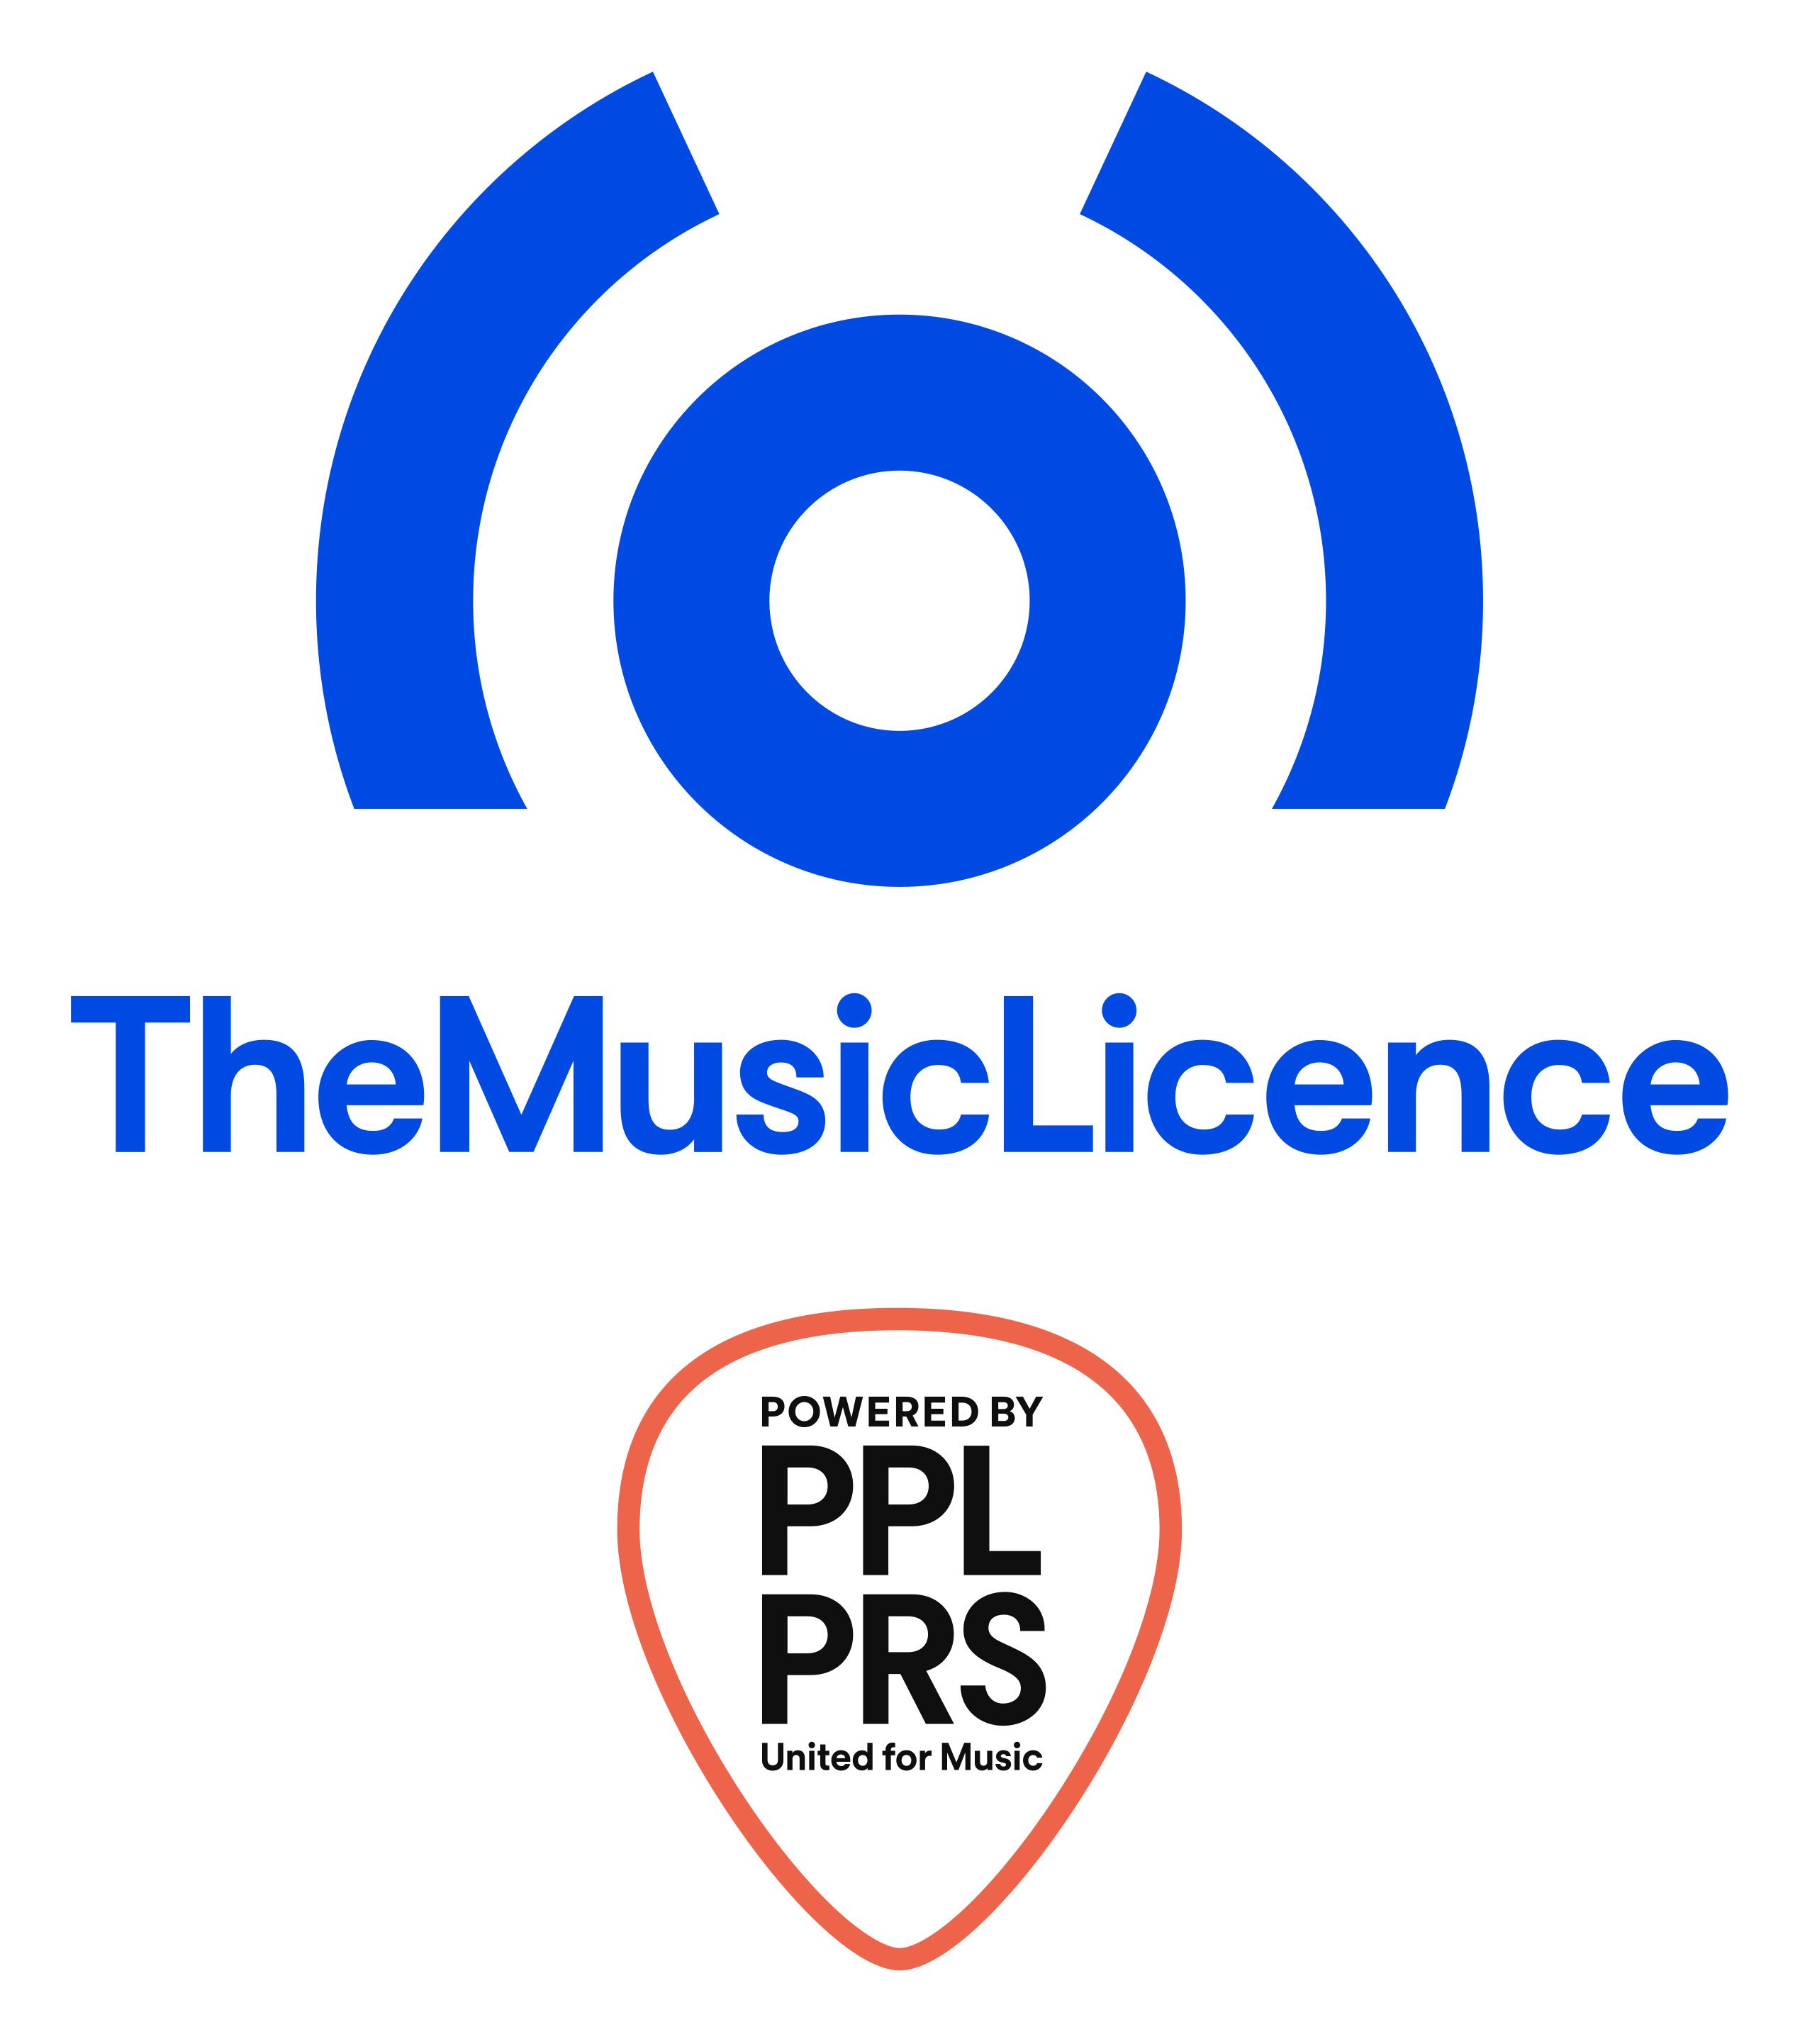 PPL PRS Ltd